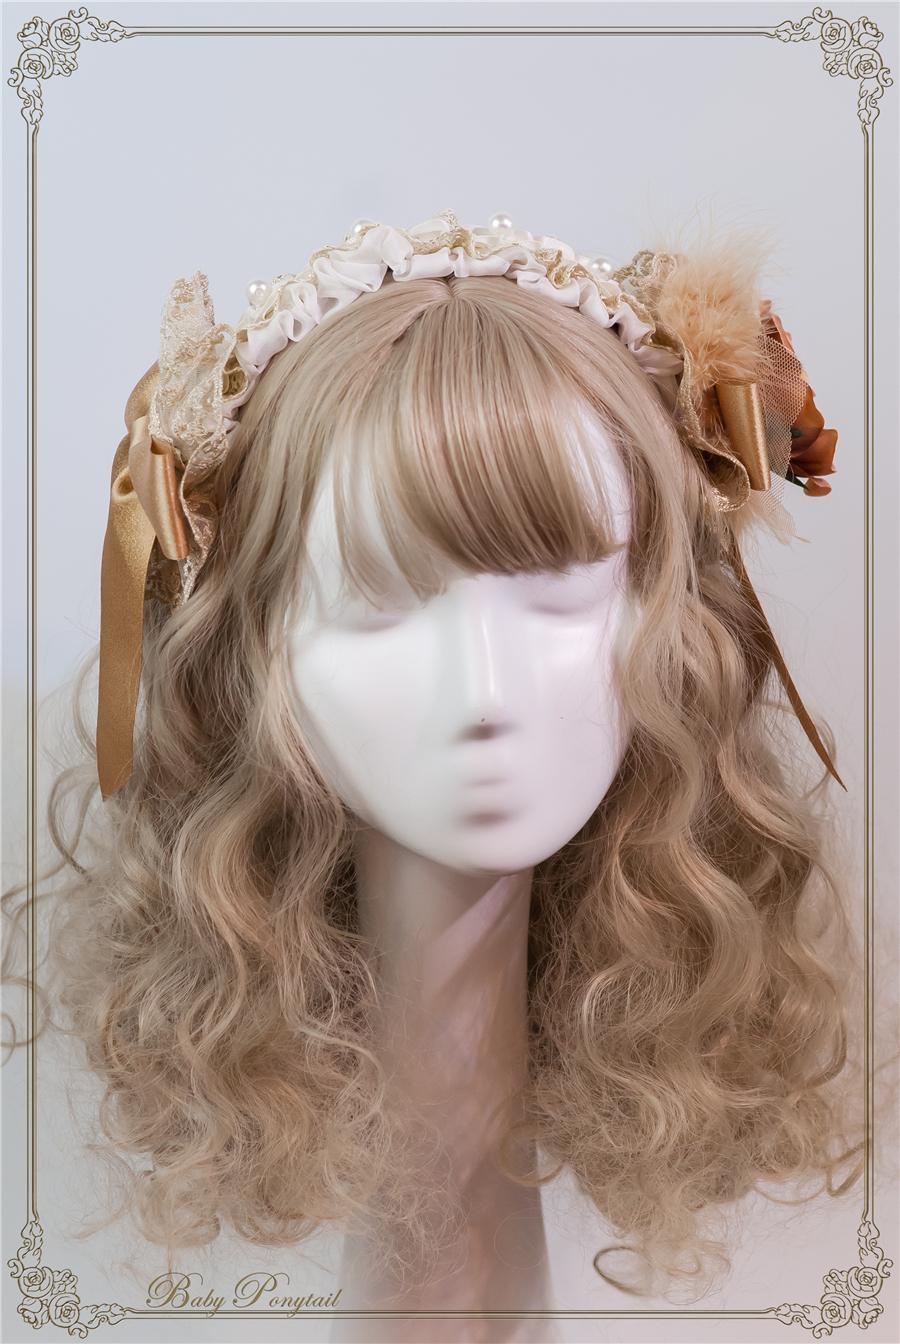 Baby Ponytail_Stock photo_Circus Princess_Rose Head Dress Golden_06.jpg